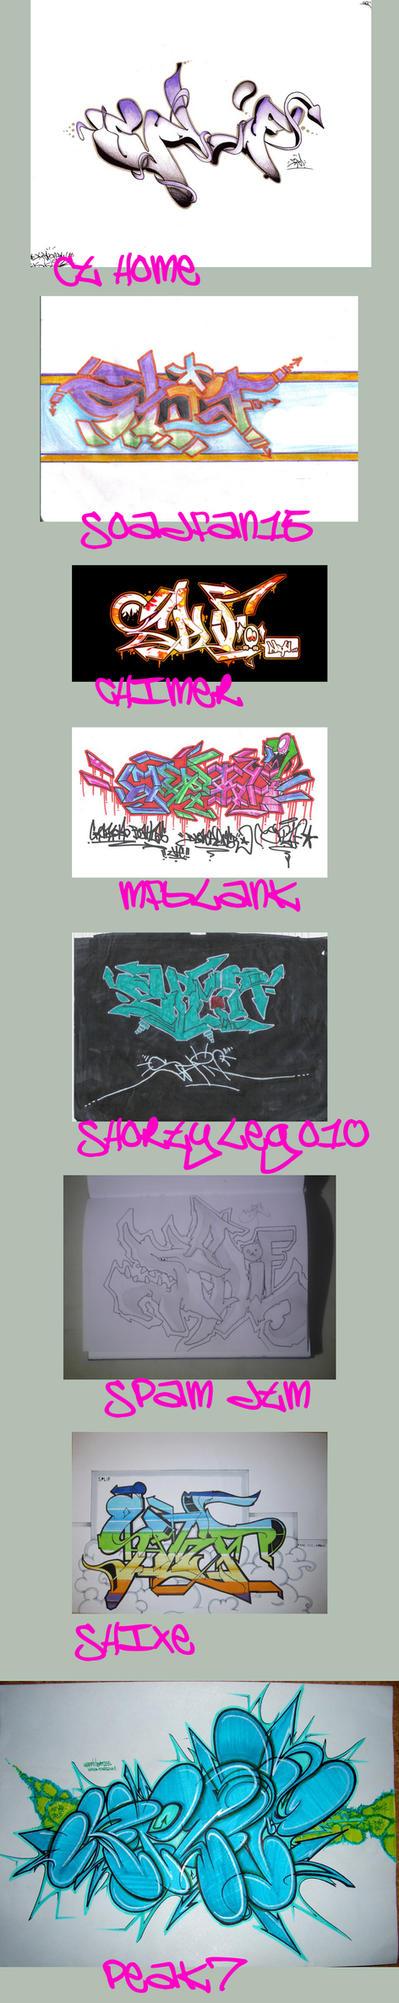 Splif by Graffiti-Battles